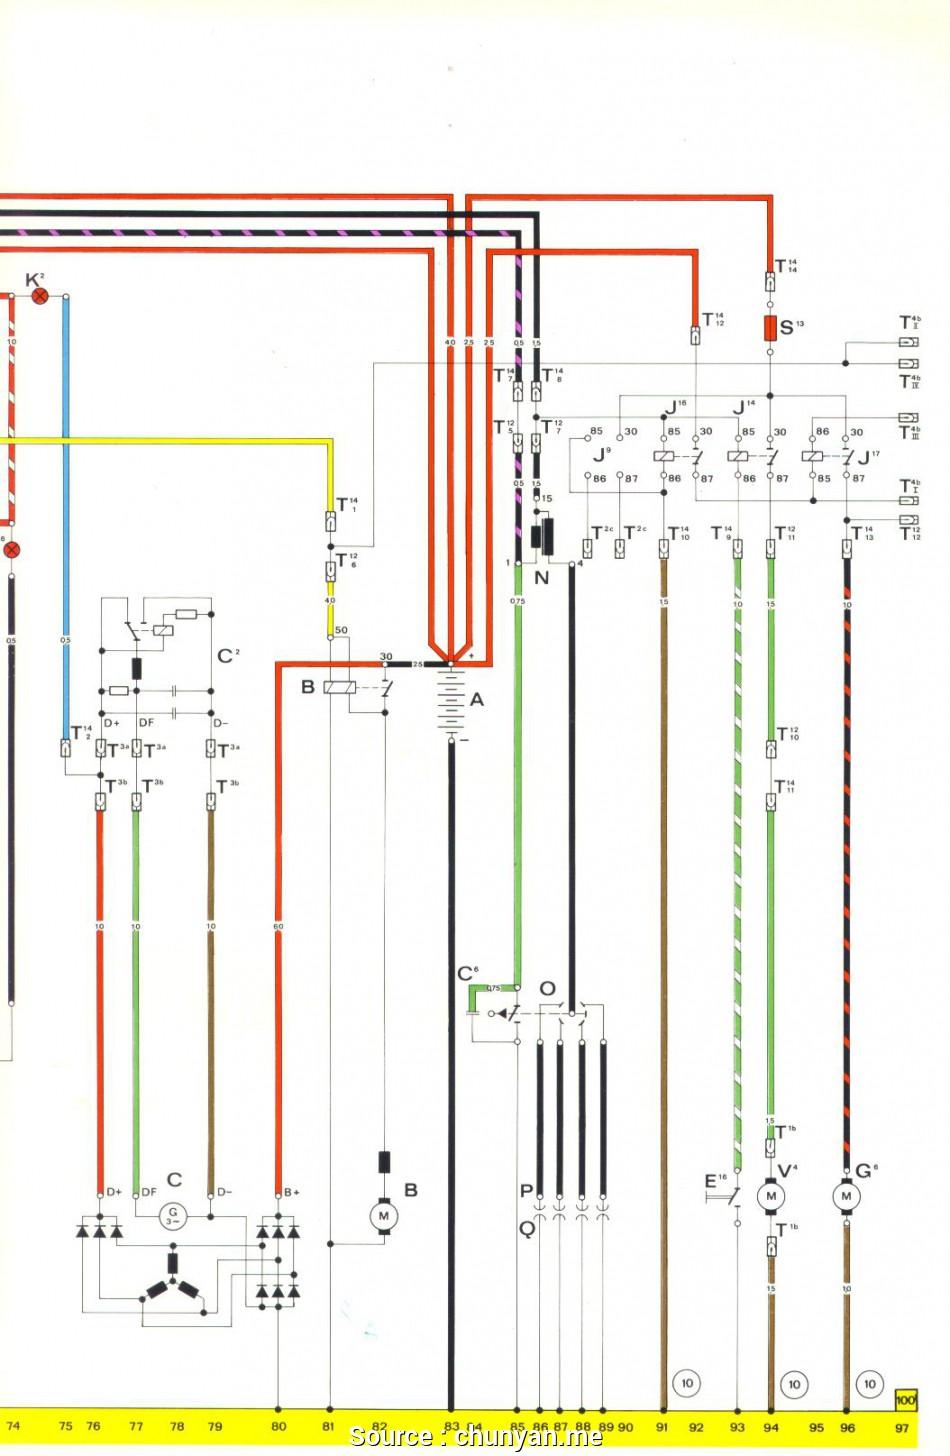 [DIAGRAM_3NM]  DF_6874] Renault Towbar Wiring Diagram | Wiring Diagram Renault Kangoo Van |  | Opogo Emba Mohammedshrine Librar Wiring 101